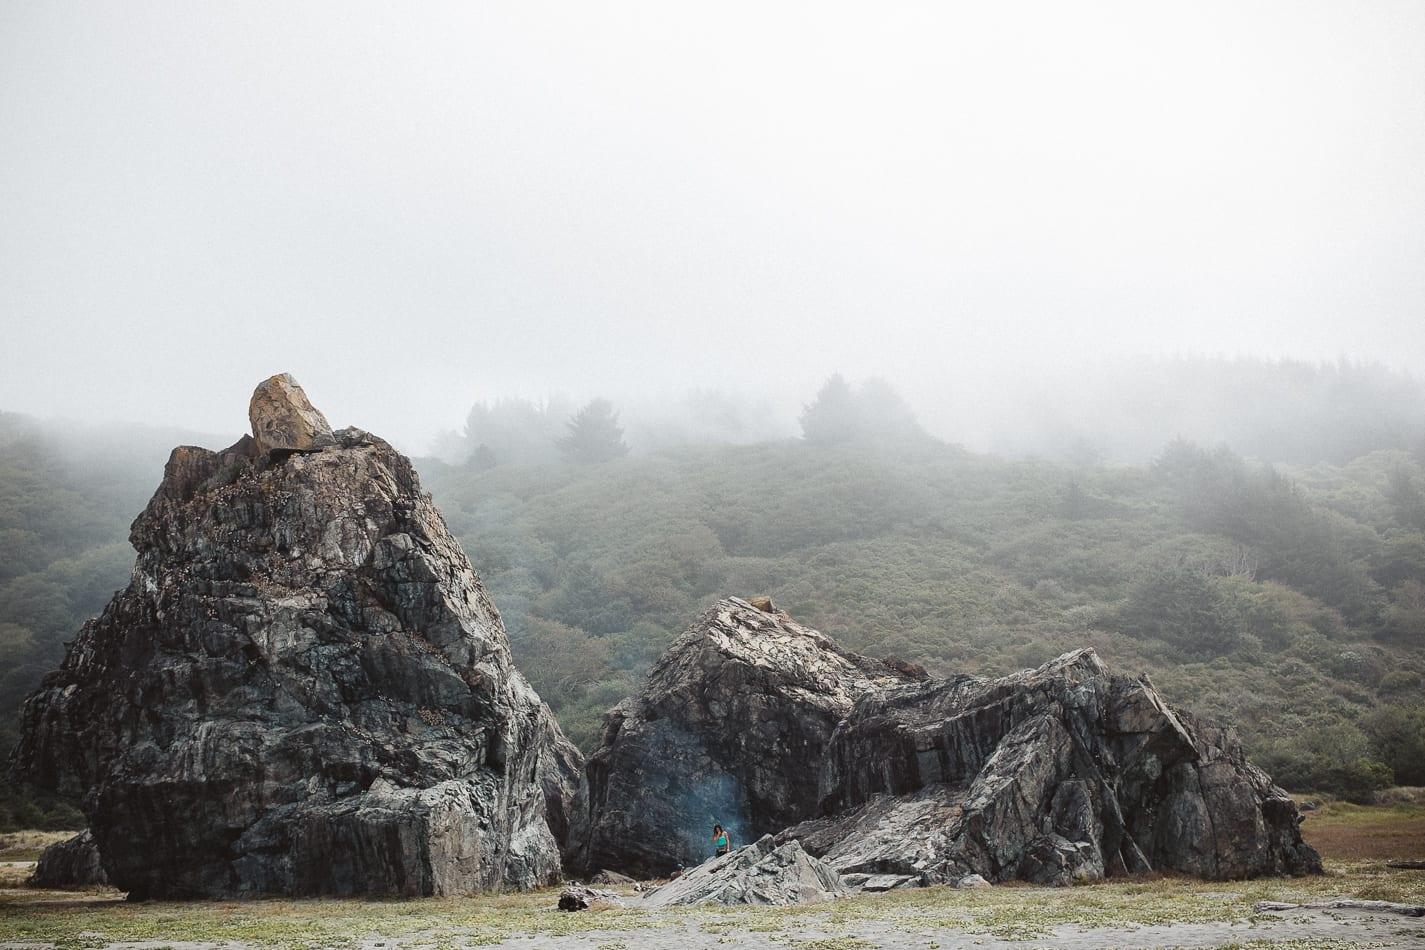 patricks-point-beach-camping-california-adventure-photographer-17